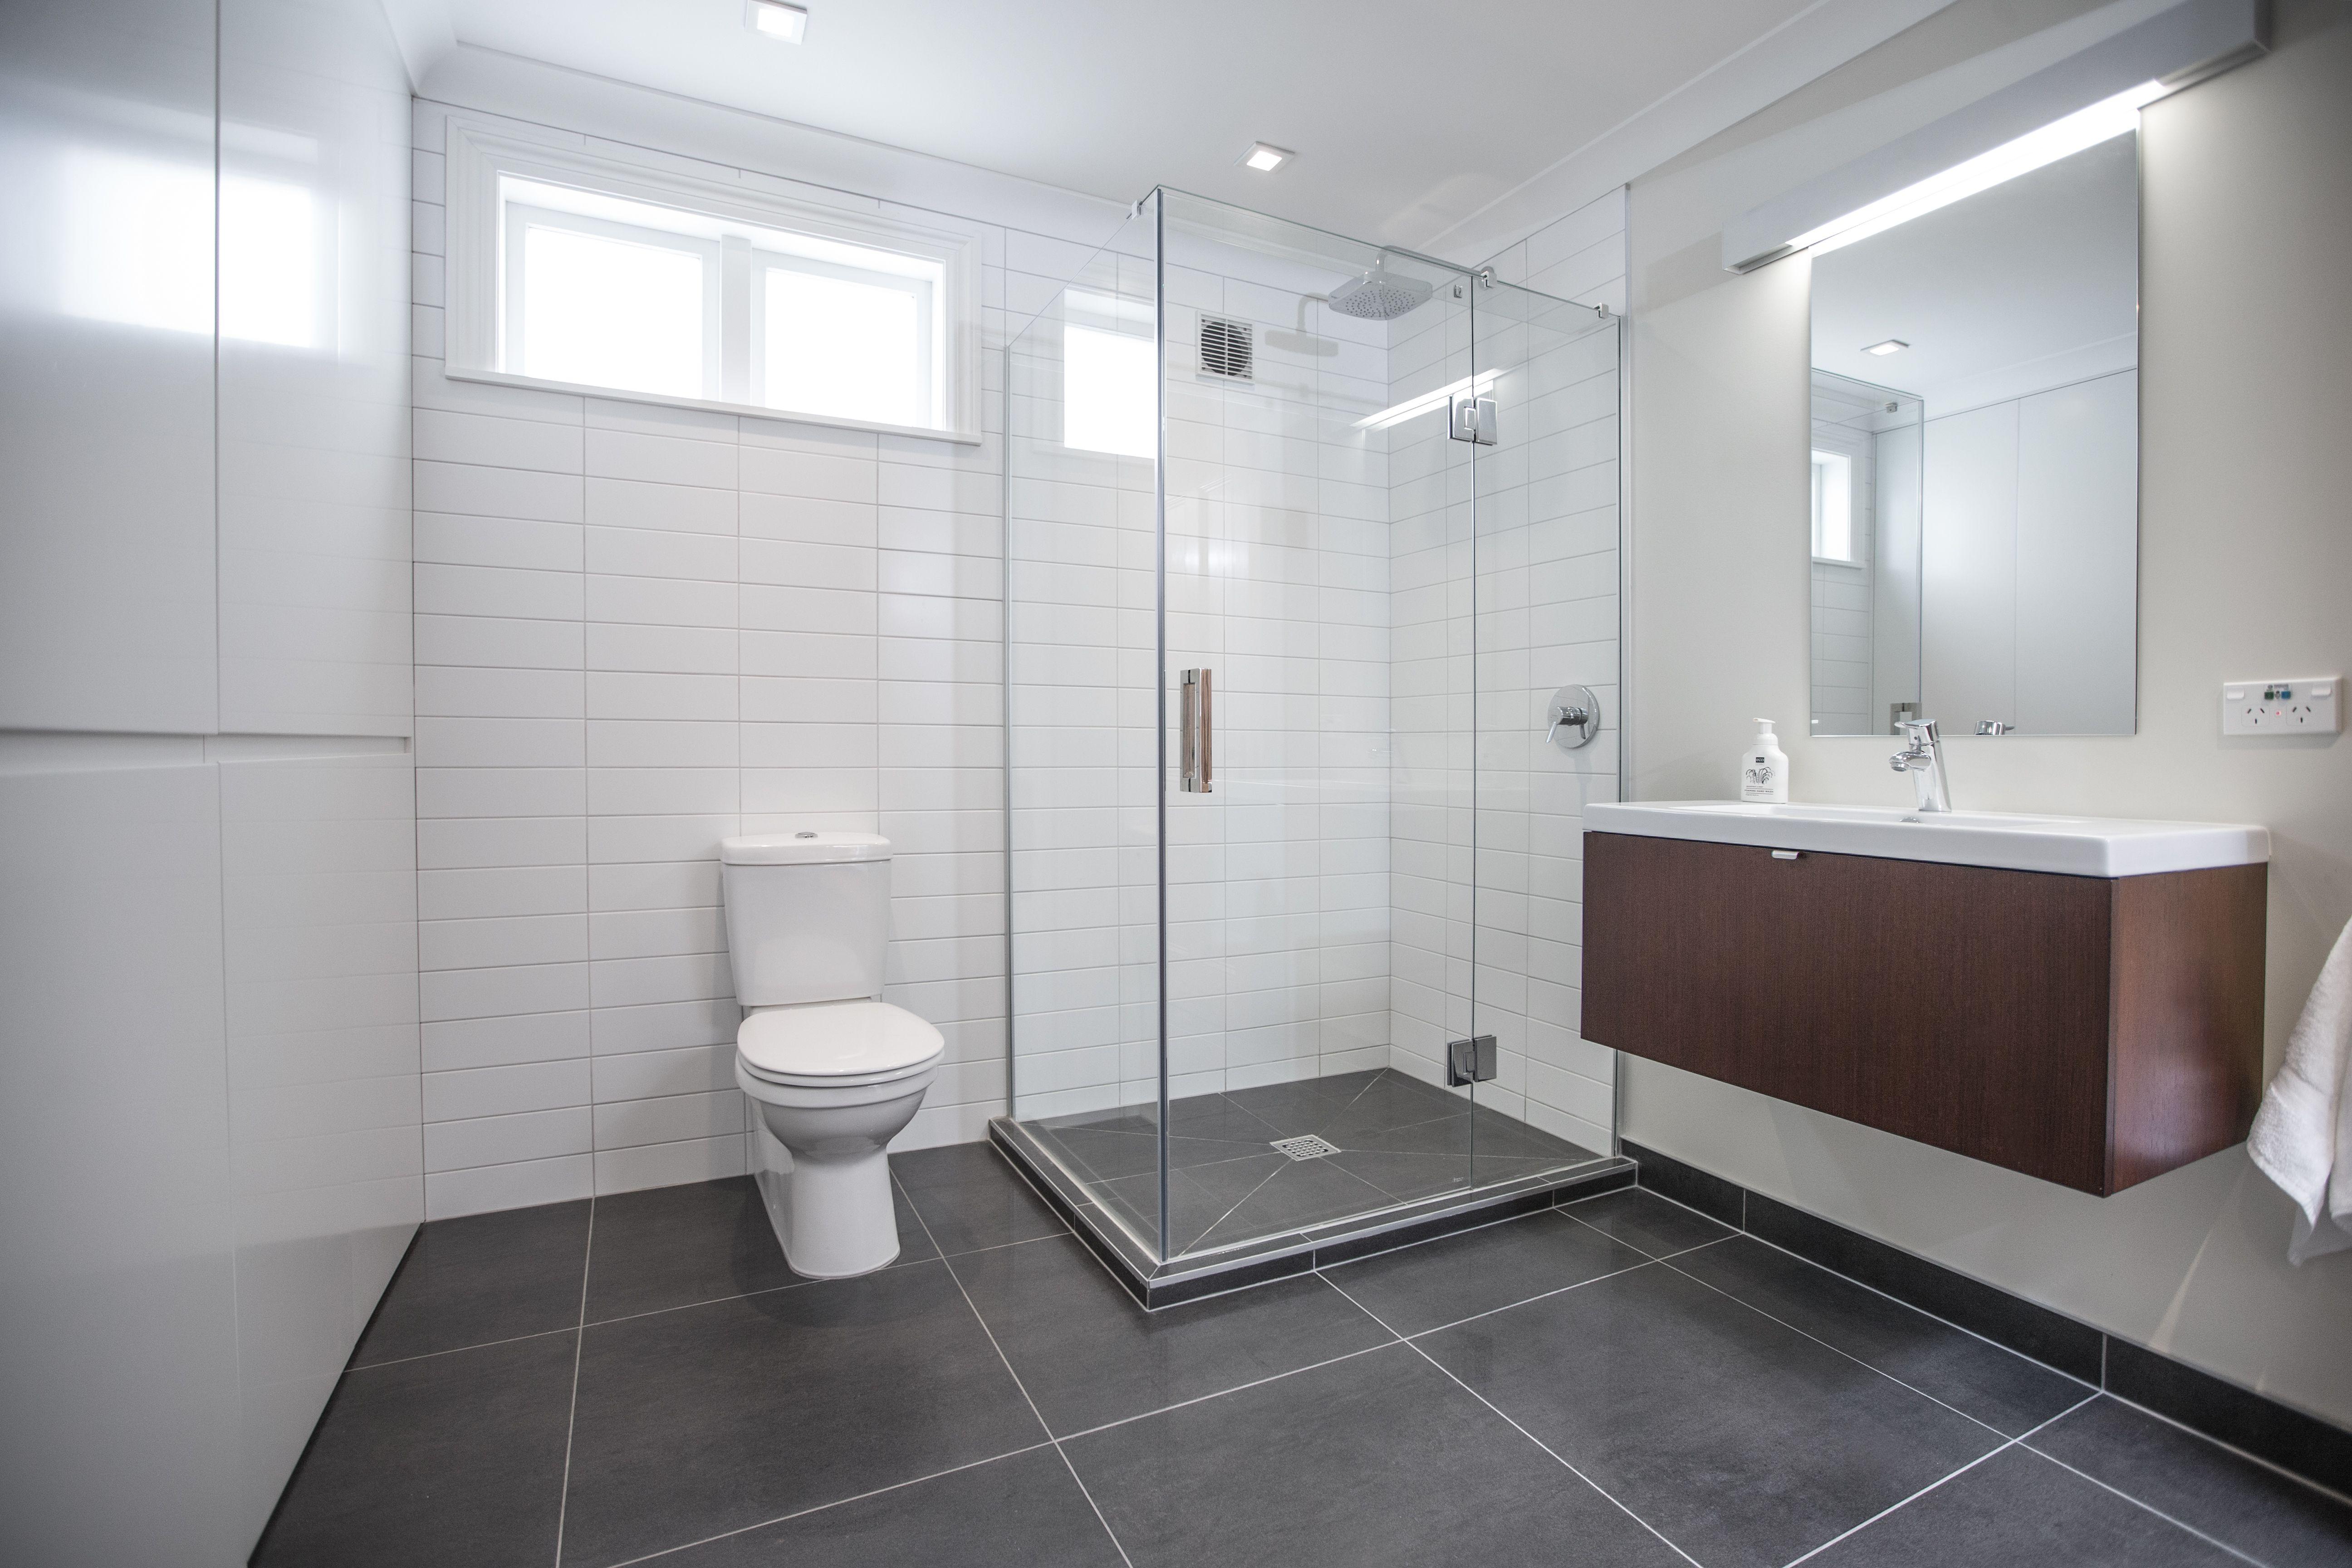 bathroom 503 sally steer design wellington new zealand on bathroom renovation ideas nz id=56202